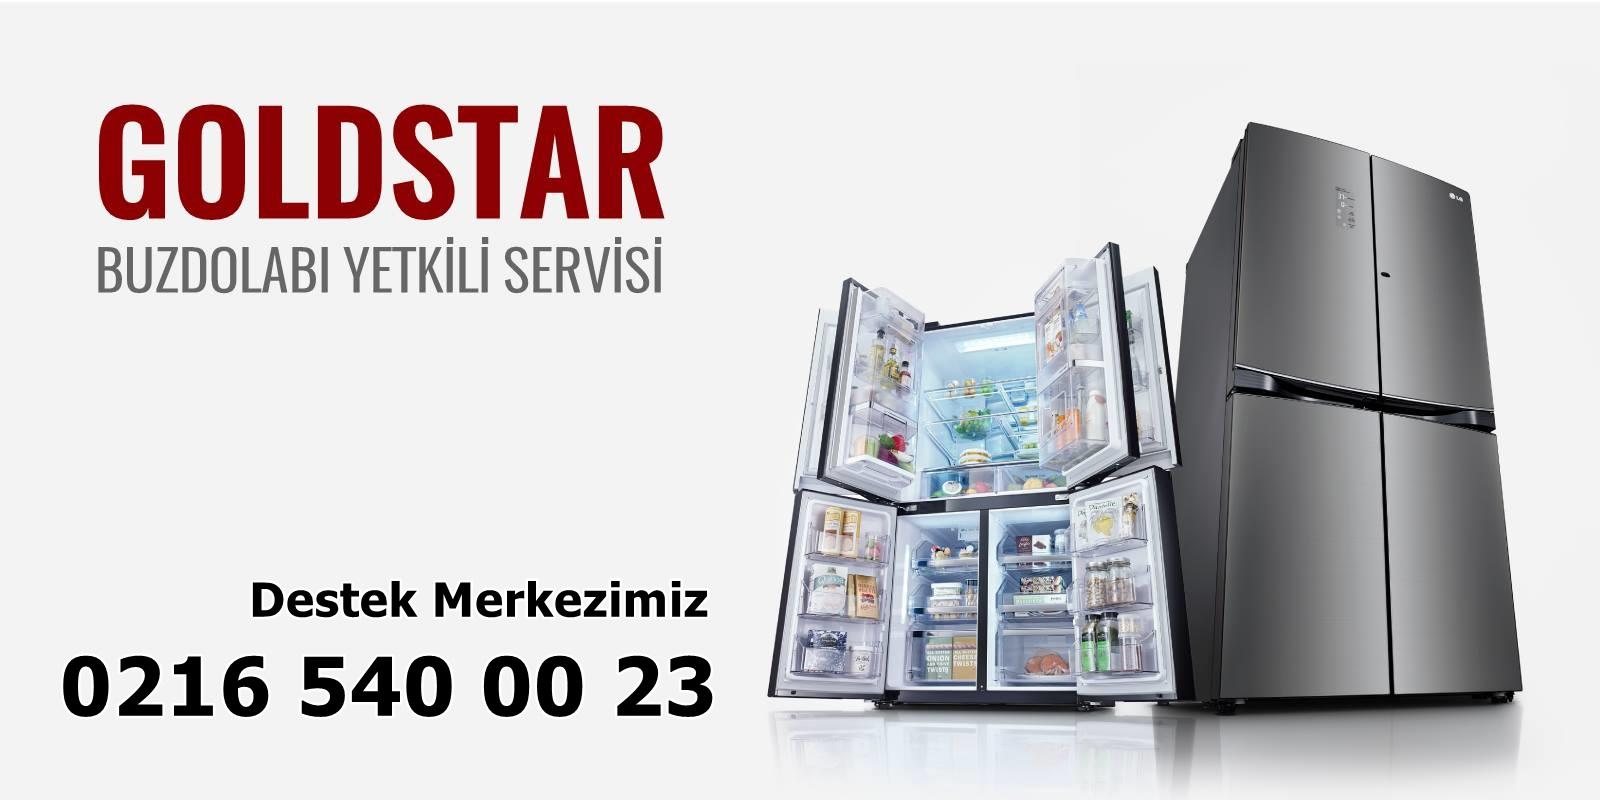 Fenerbahçe Goldstar Servisi